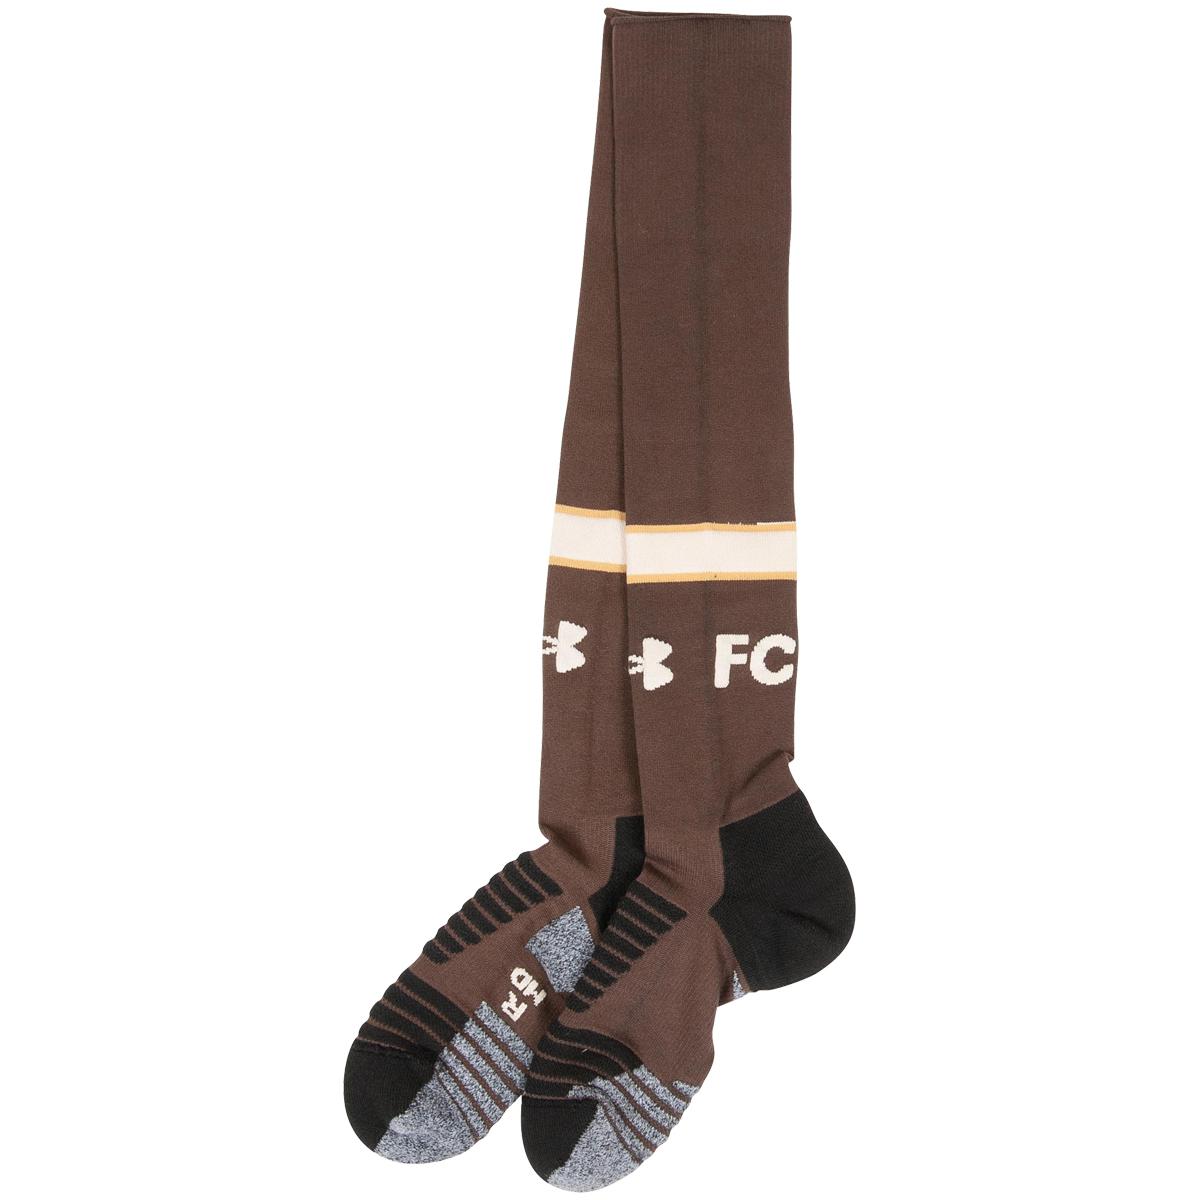 FC St. Pauli - Stutzen Heim 2020-21 - braun